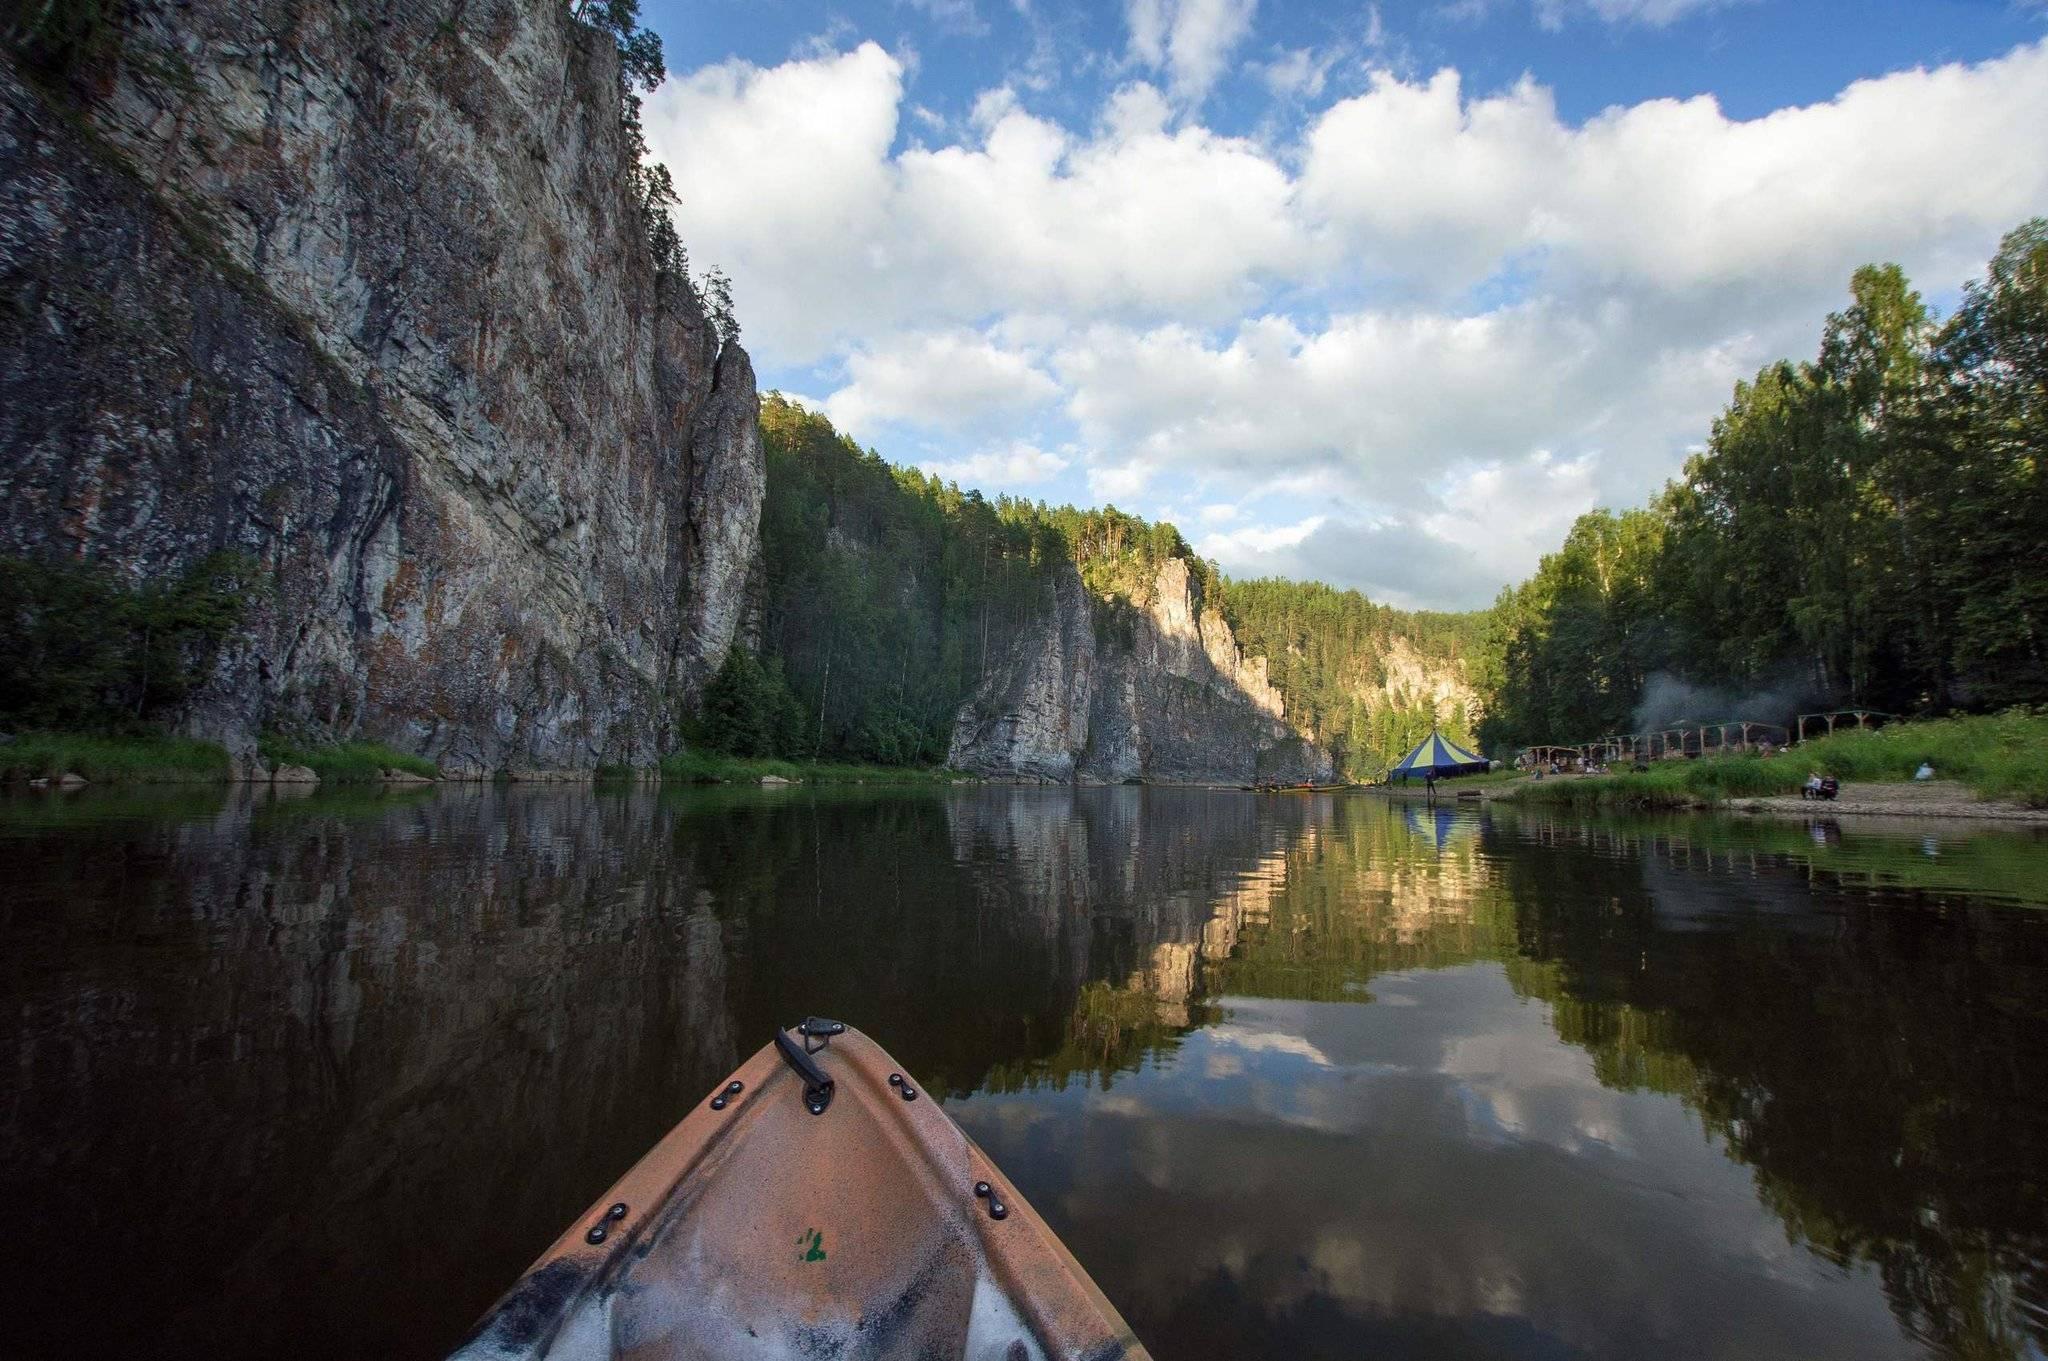 Река реж. путеводитель по маршруту сплава